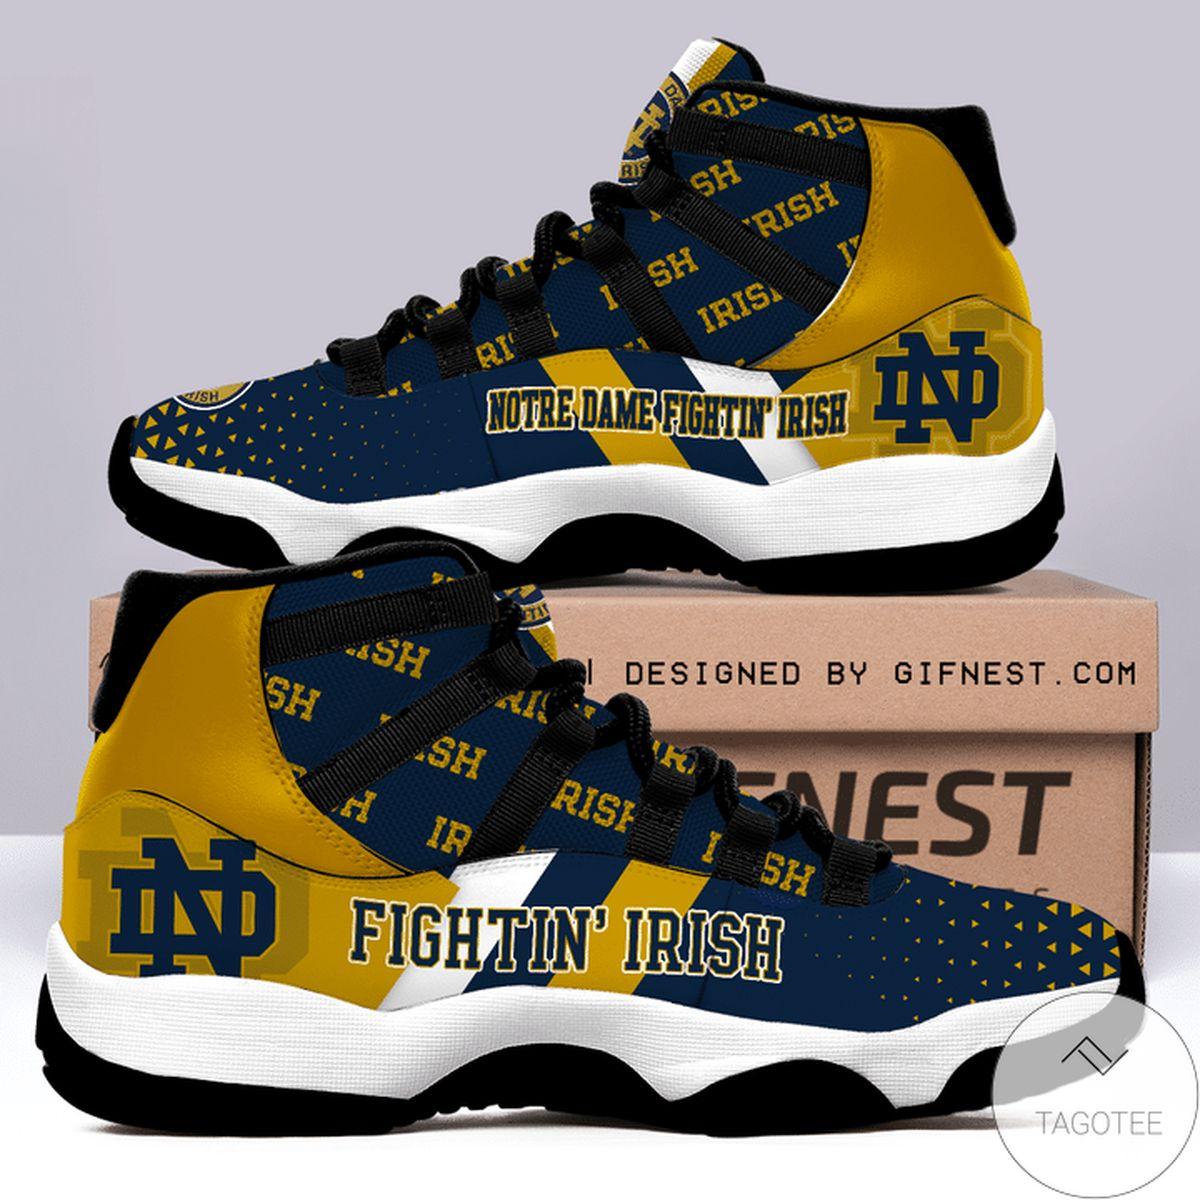 Notre Dame Fighting Irish Air Jordan 11 Shoes